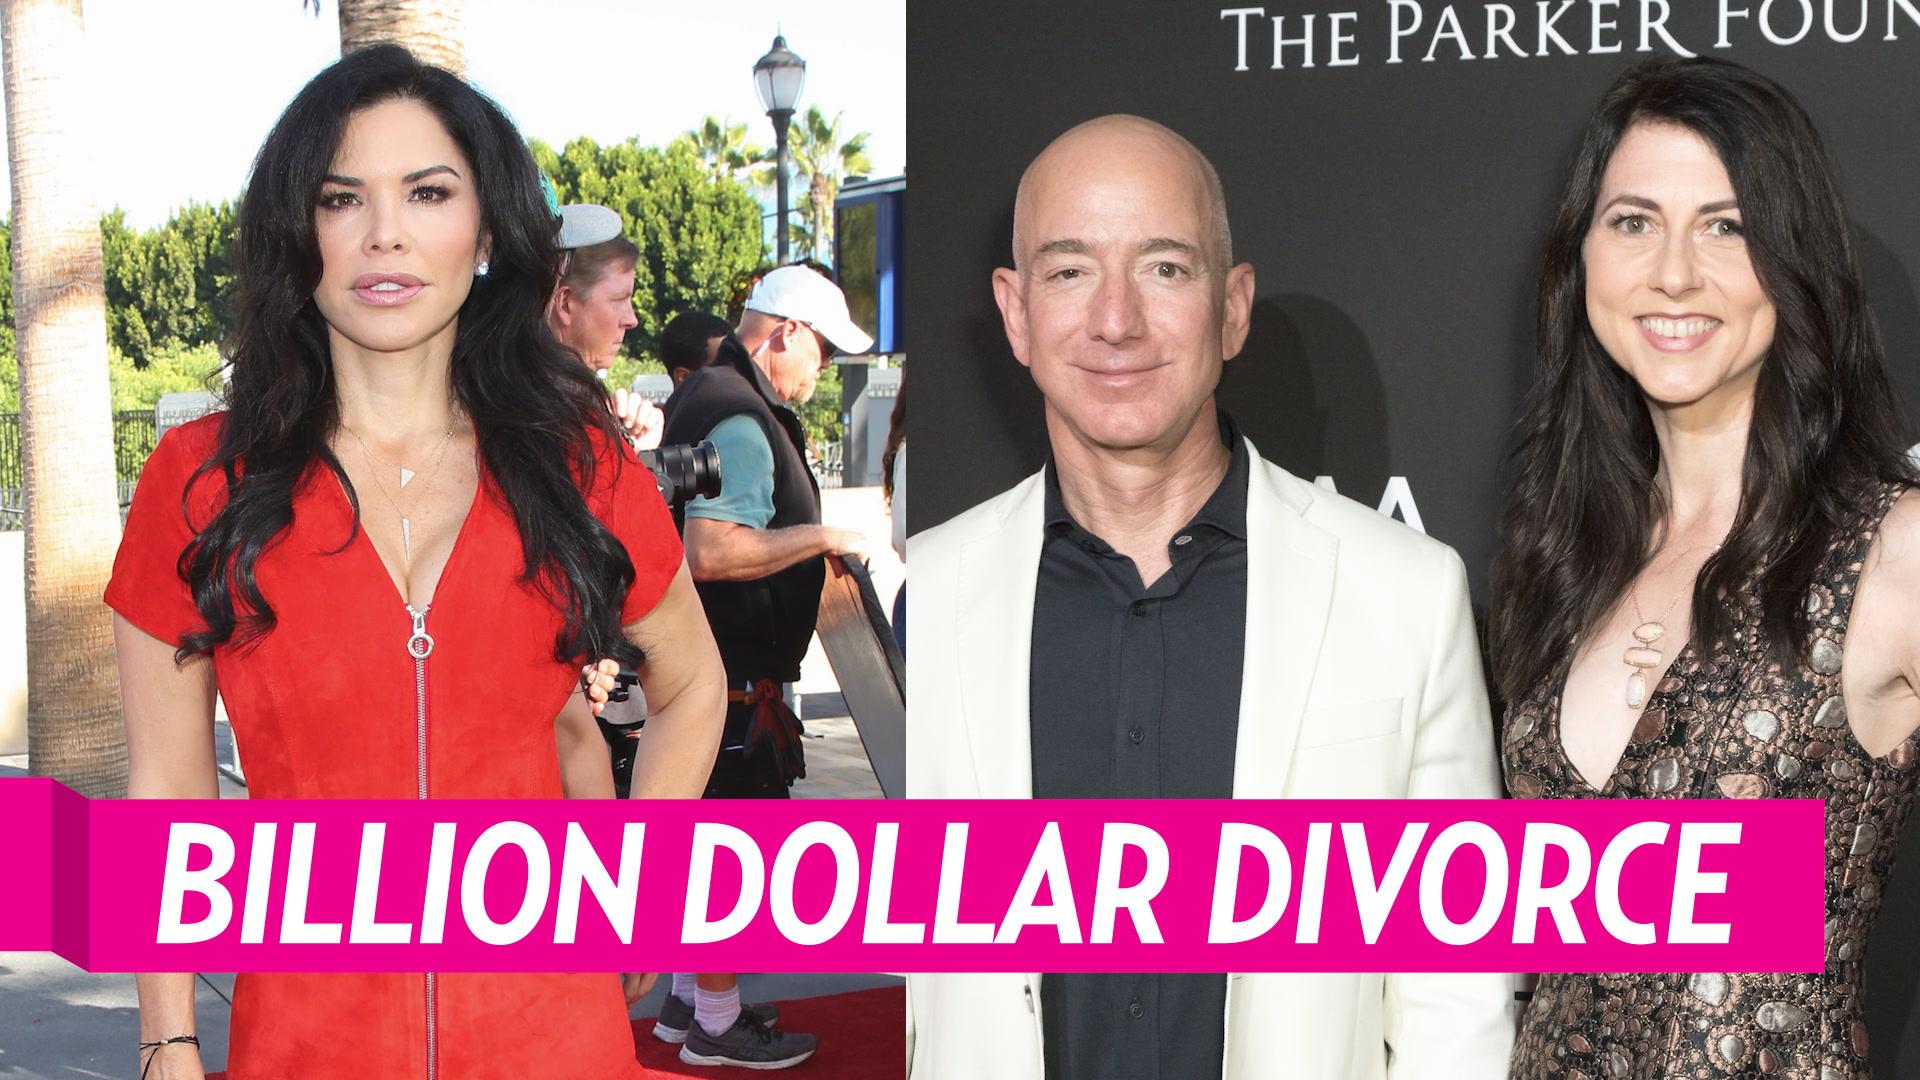 Inside Jeff Bezos's Billion Dollar Divorce